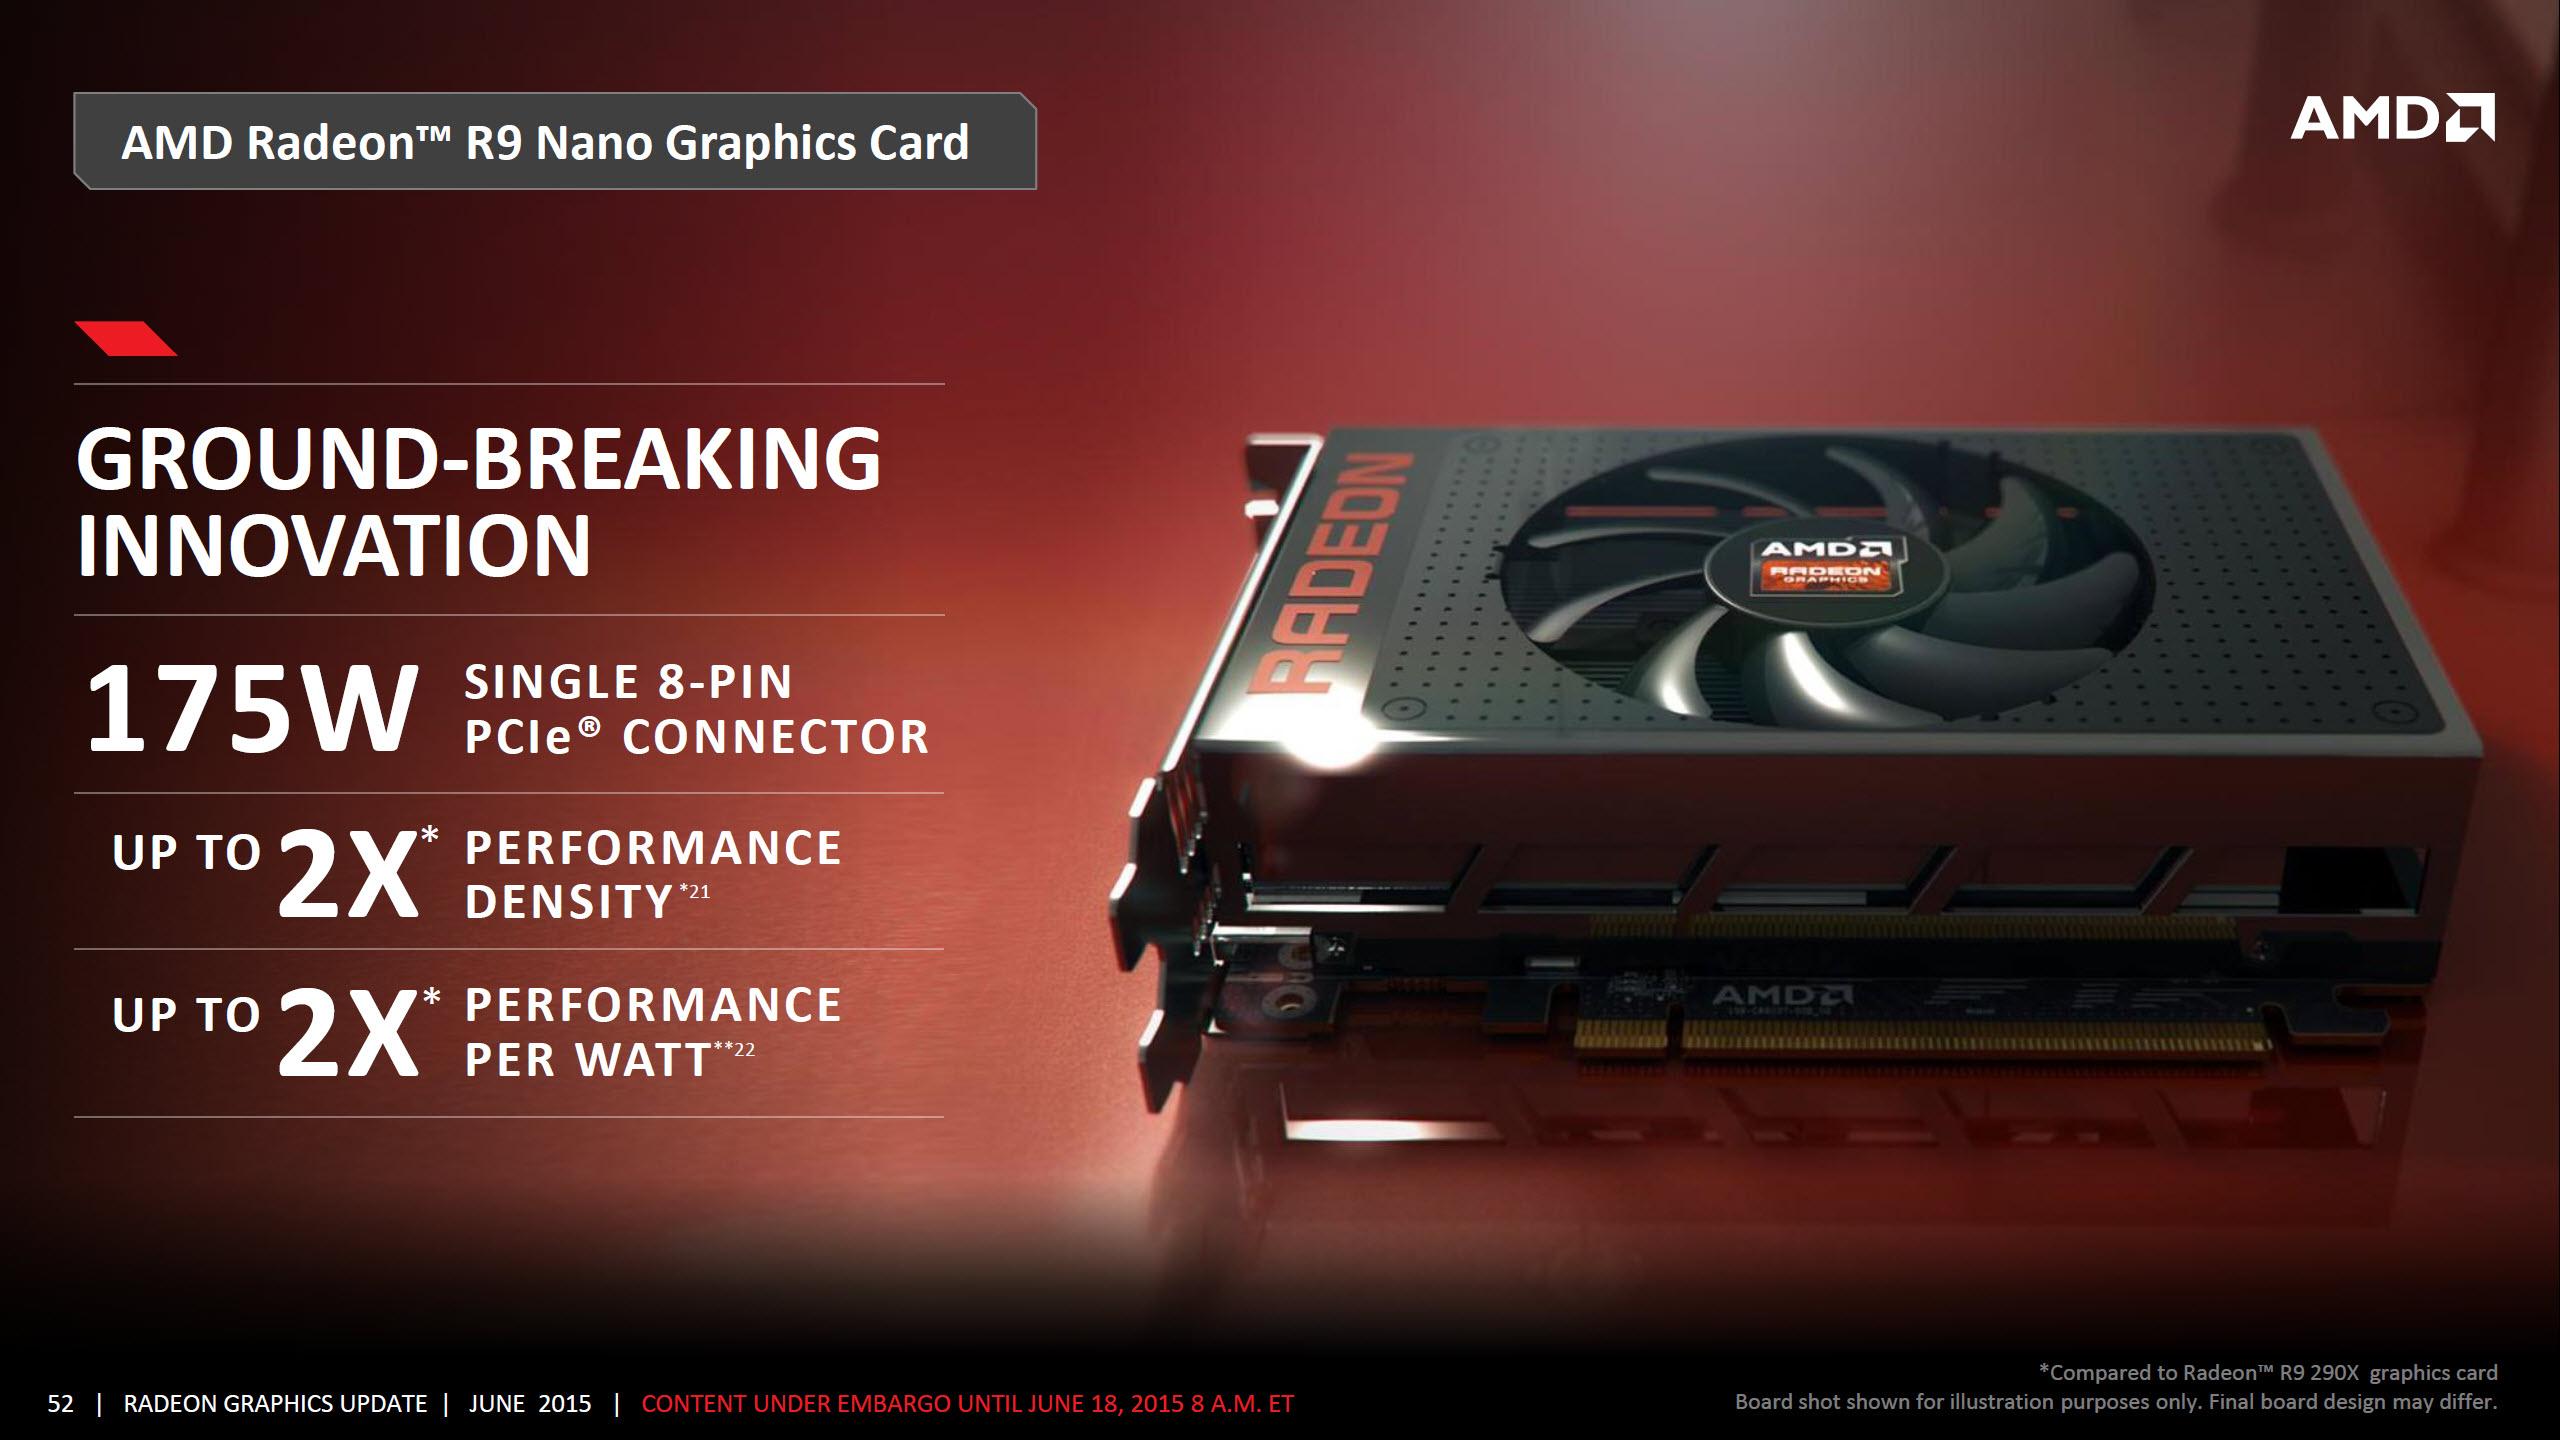 AMD Radeon R9 Nano Officially Detailed - Features Fiji GPU